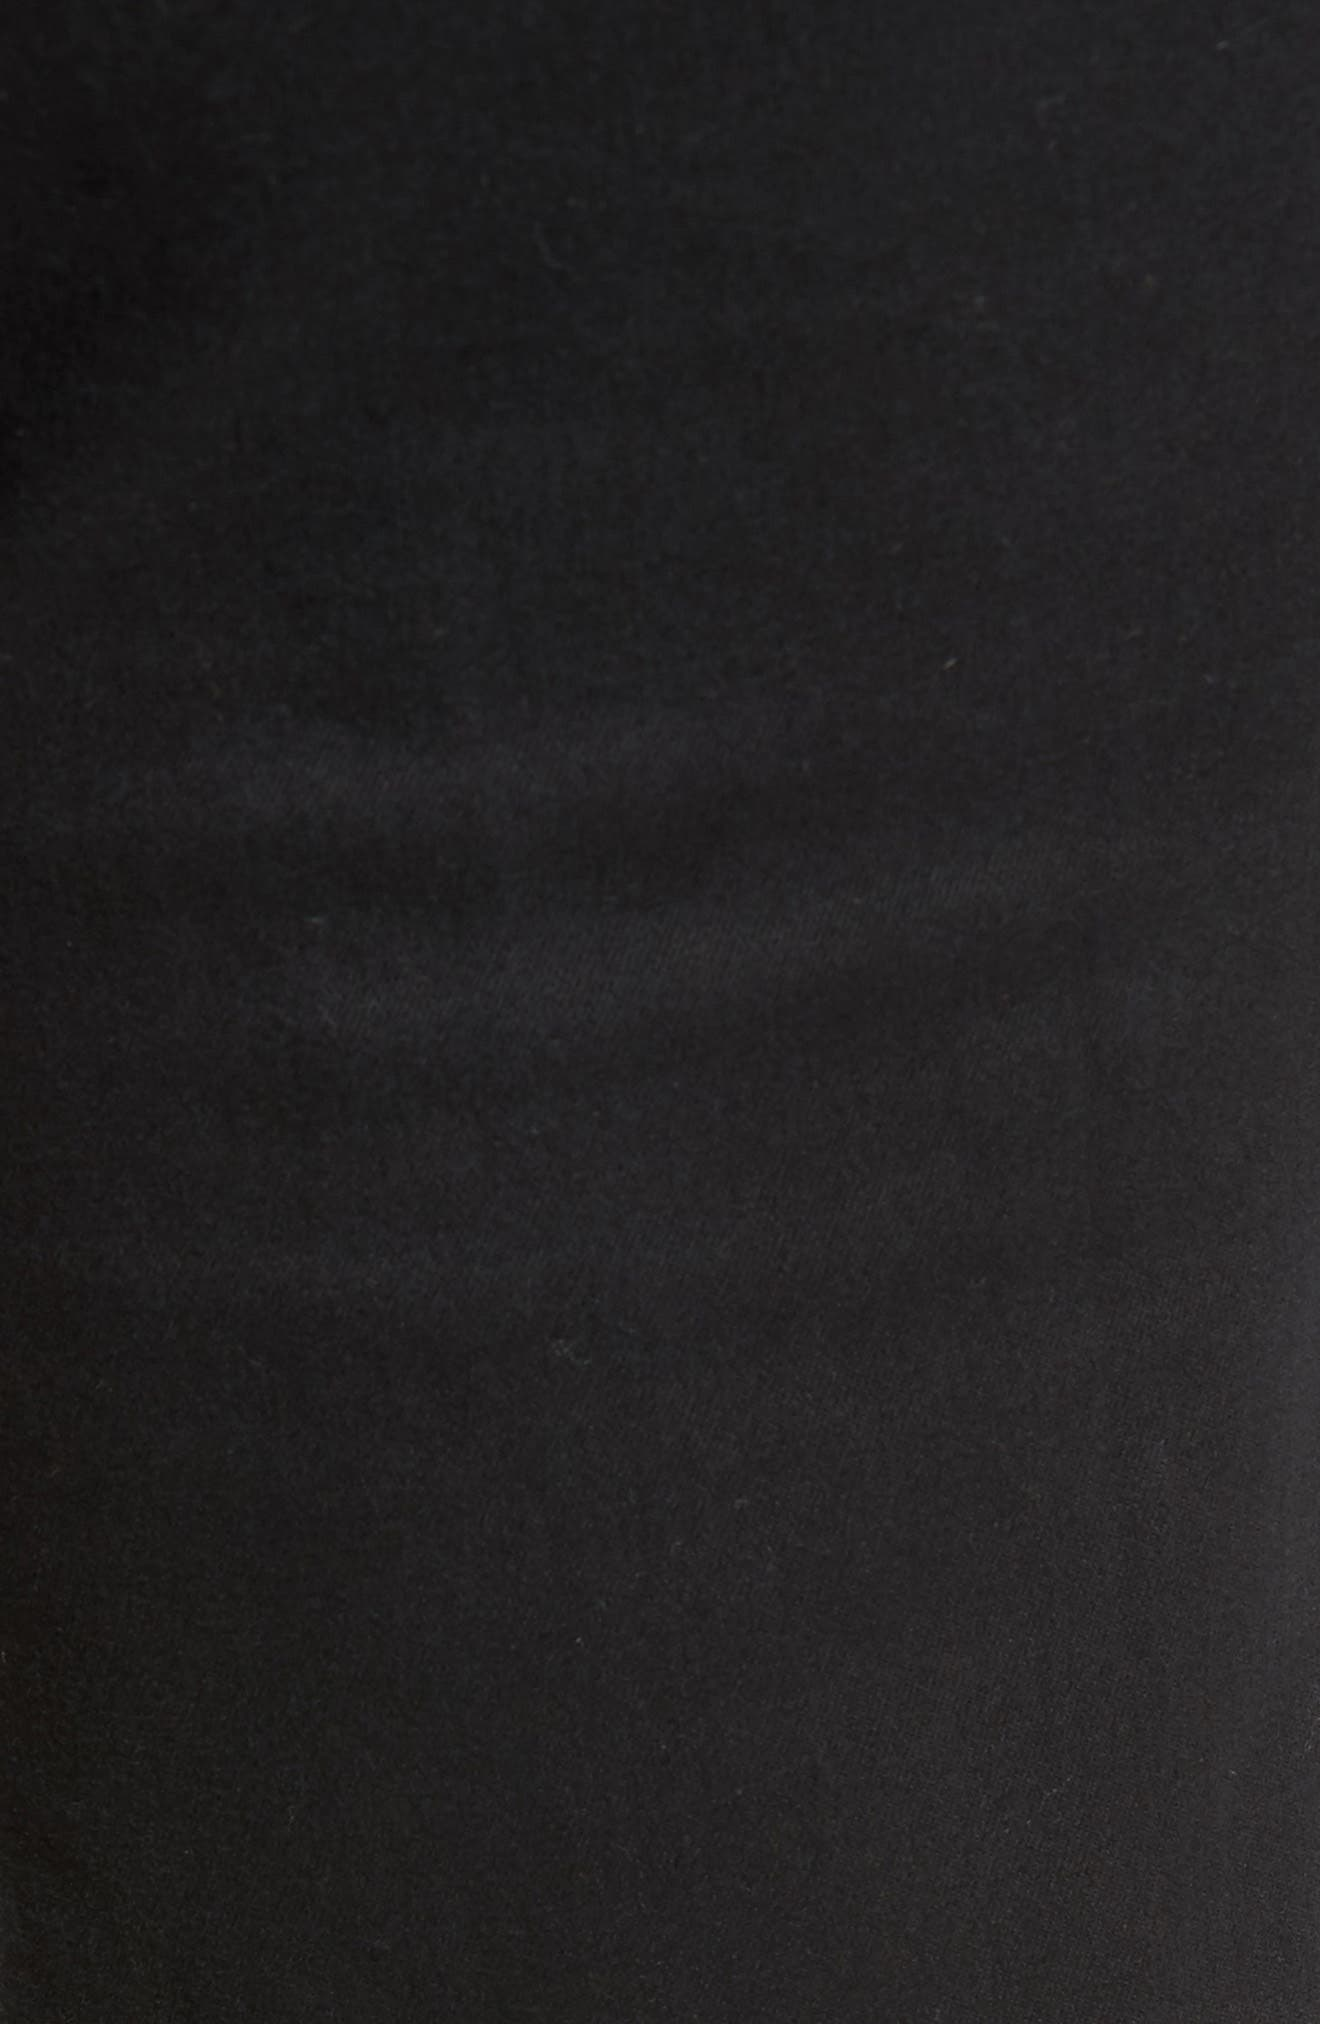 Alternate Image 3  - Wit & Wisdom Skinny Cargo Pants (Regular & Petite) (Nordstrom Exclusive)